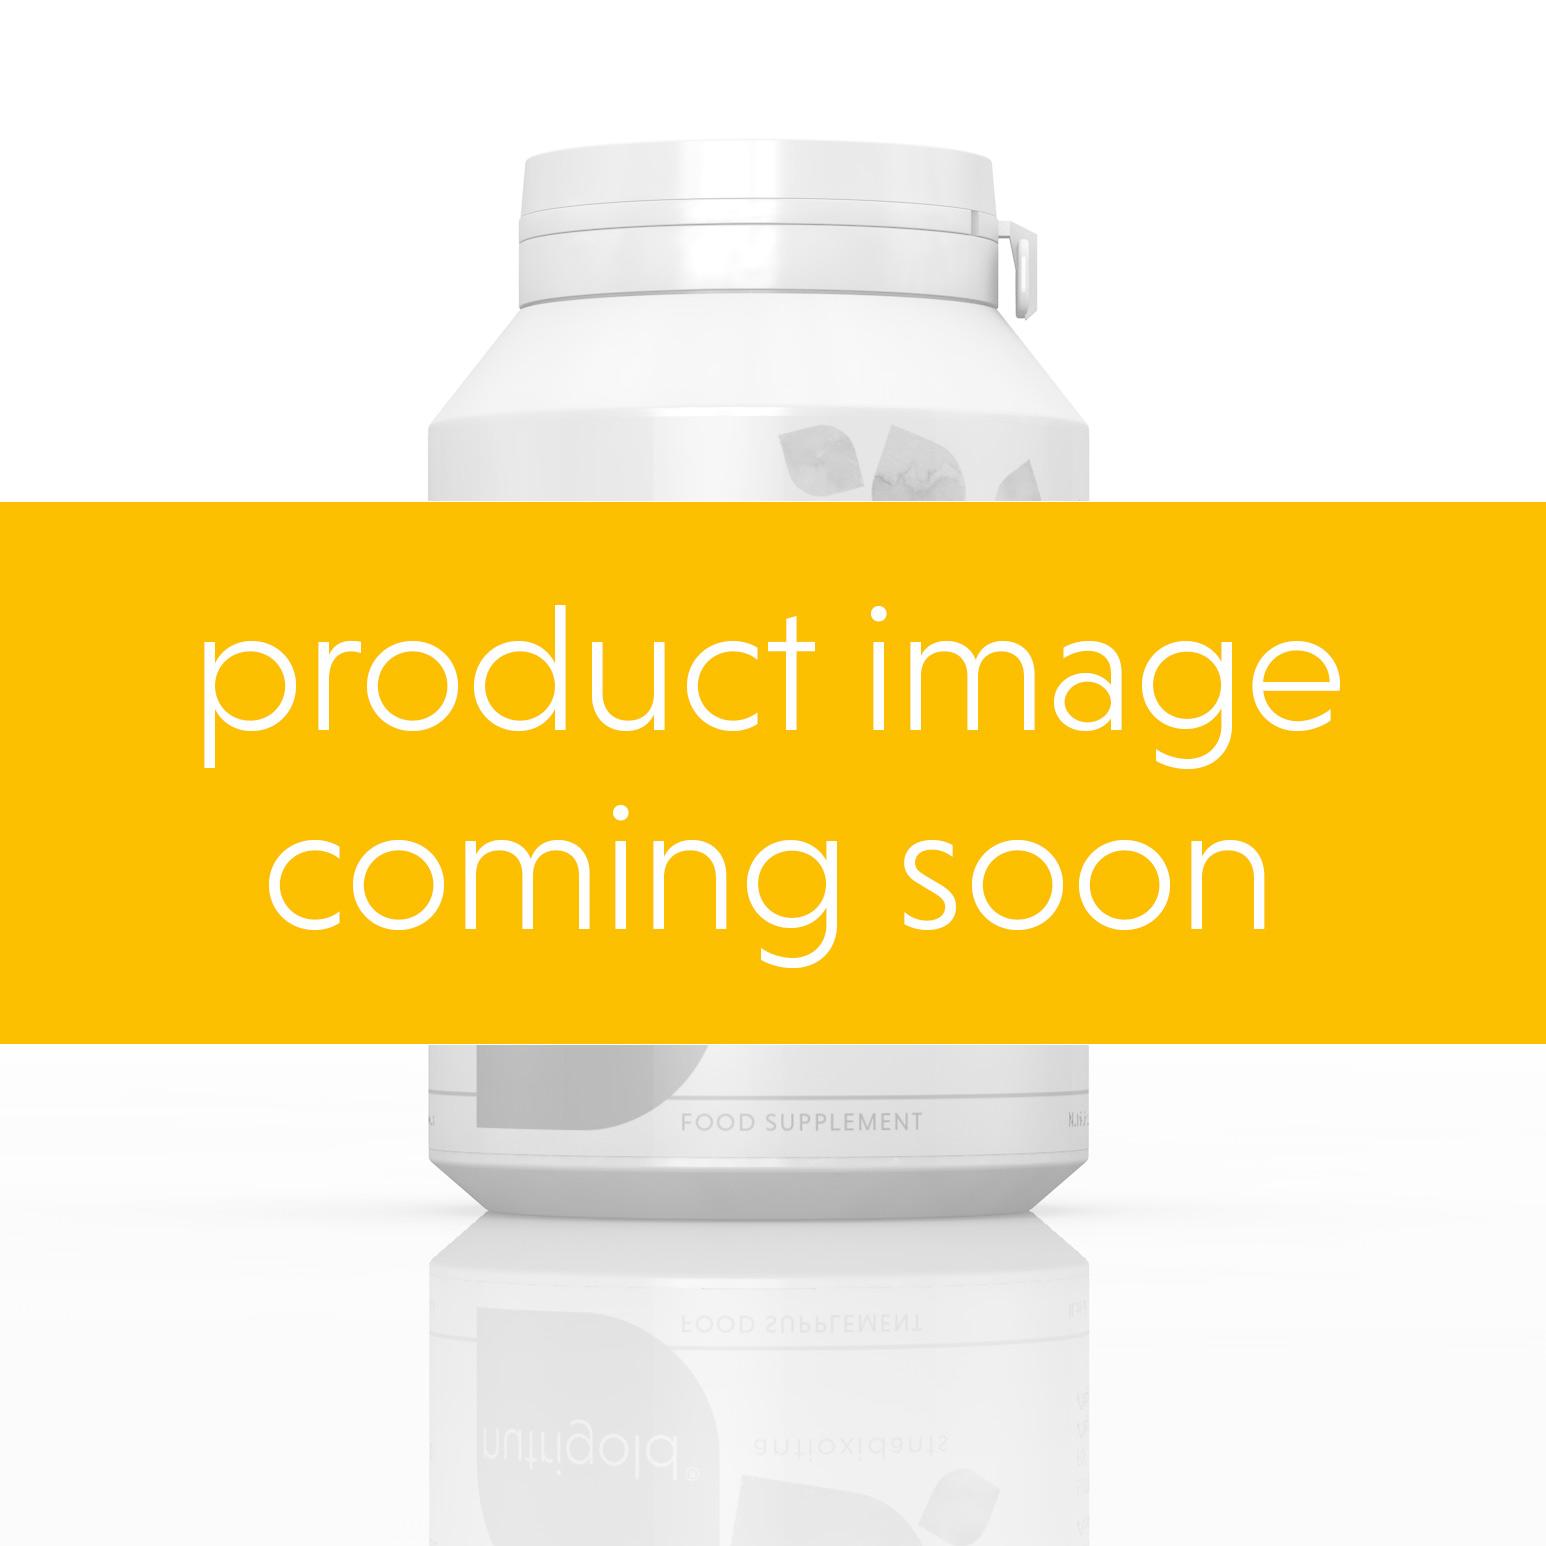 Aloe Vera Juice x 1000ml  Expiry Date 13.02.21